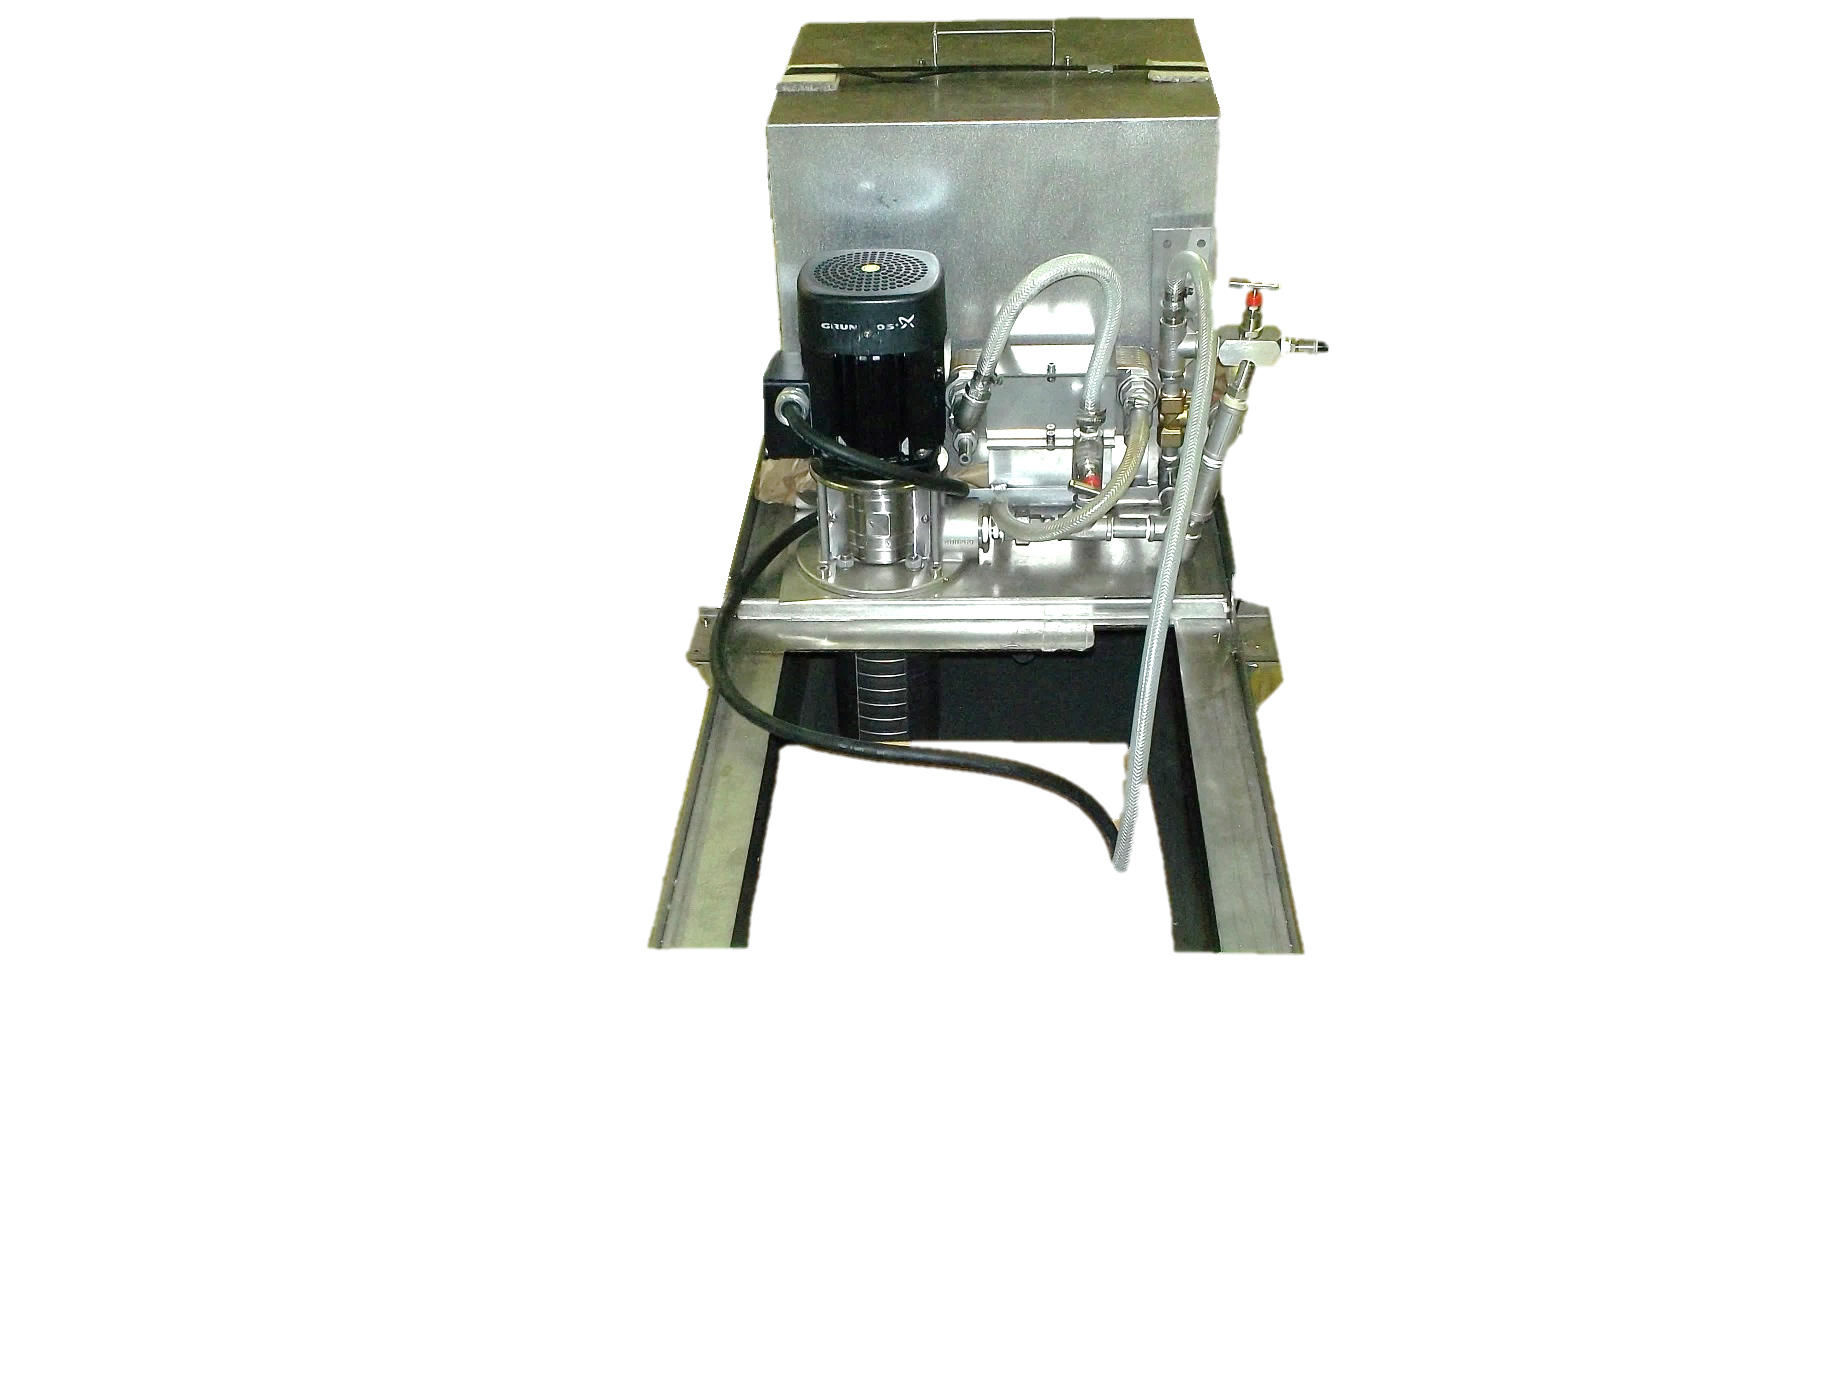 5g FHD-5 6 Axis EDM System - TEK5USA